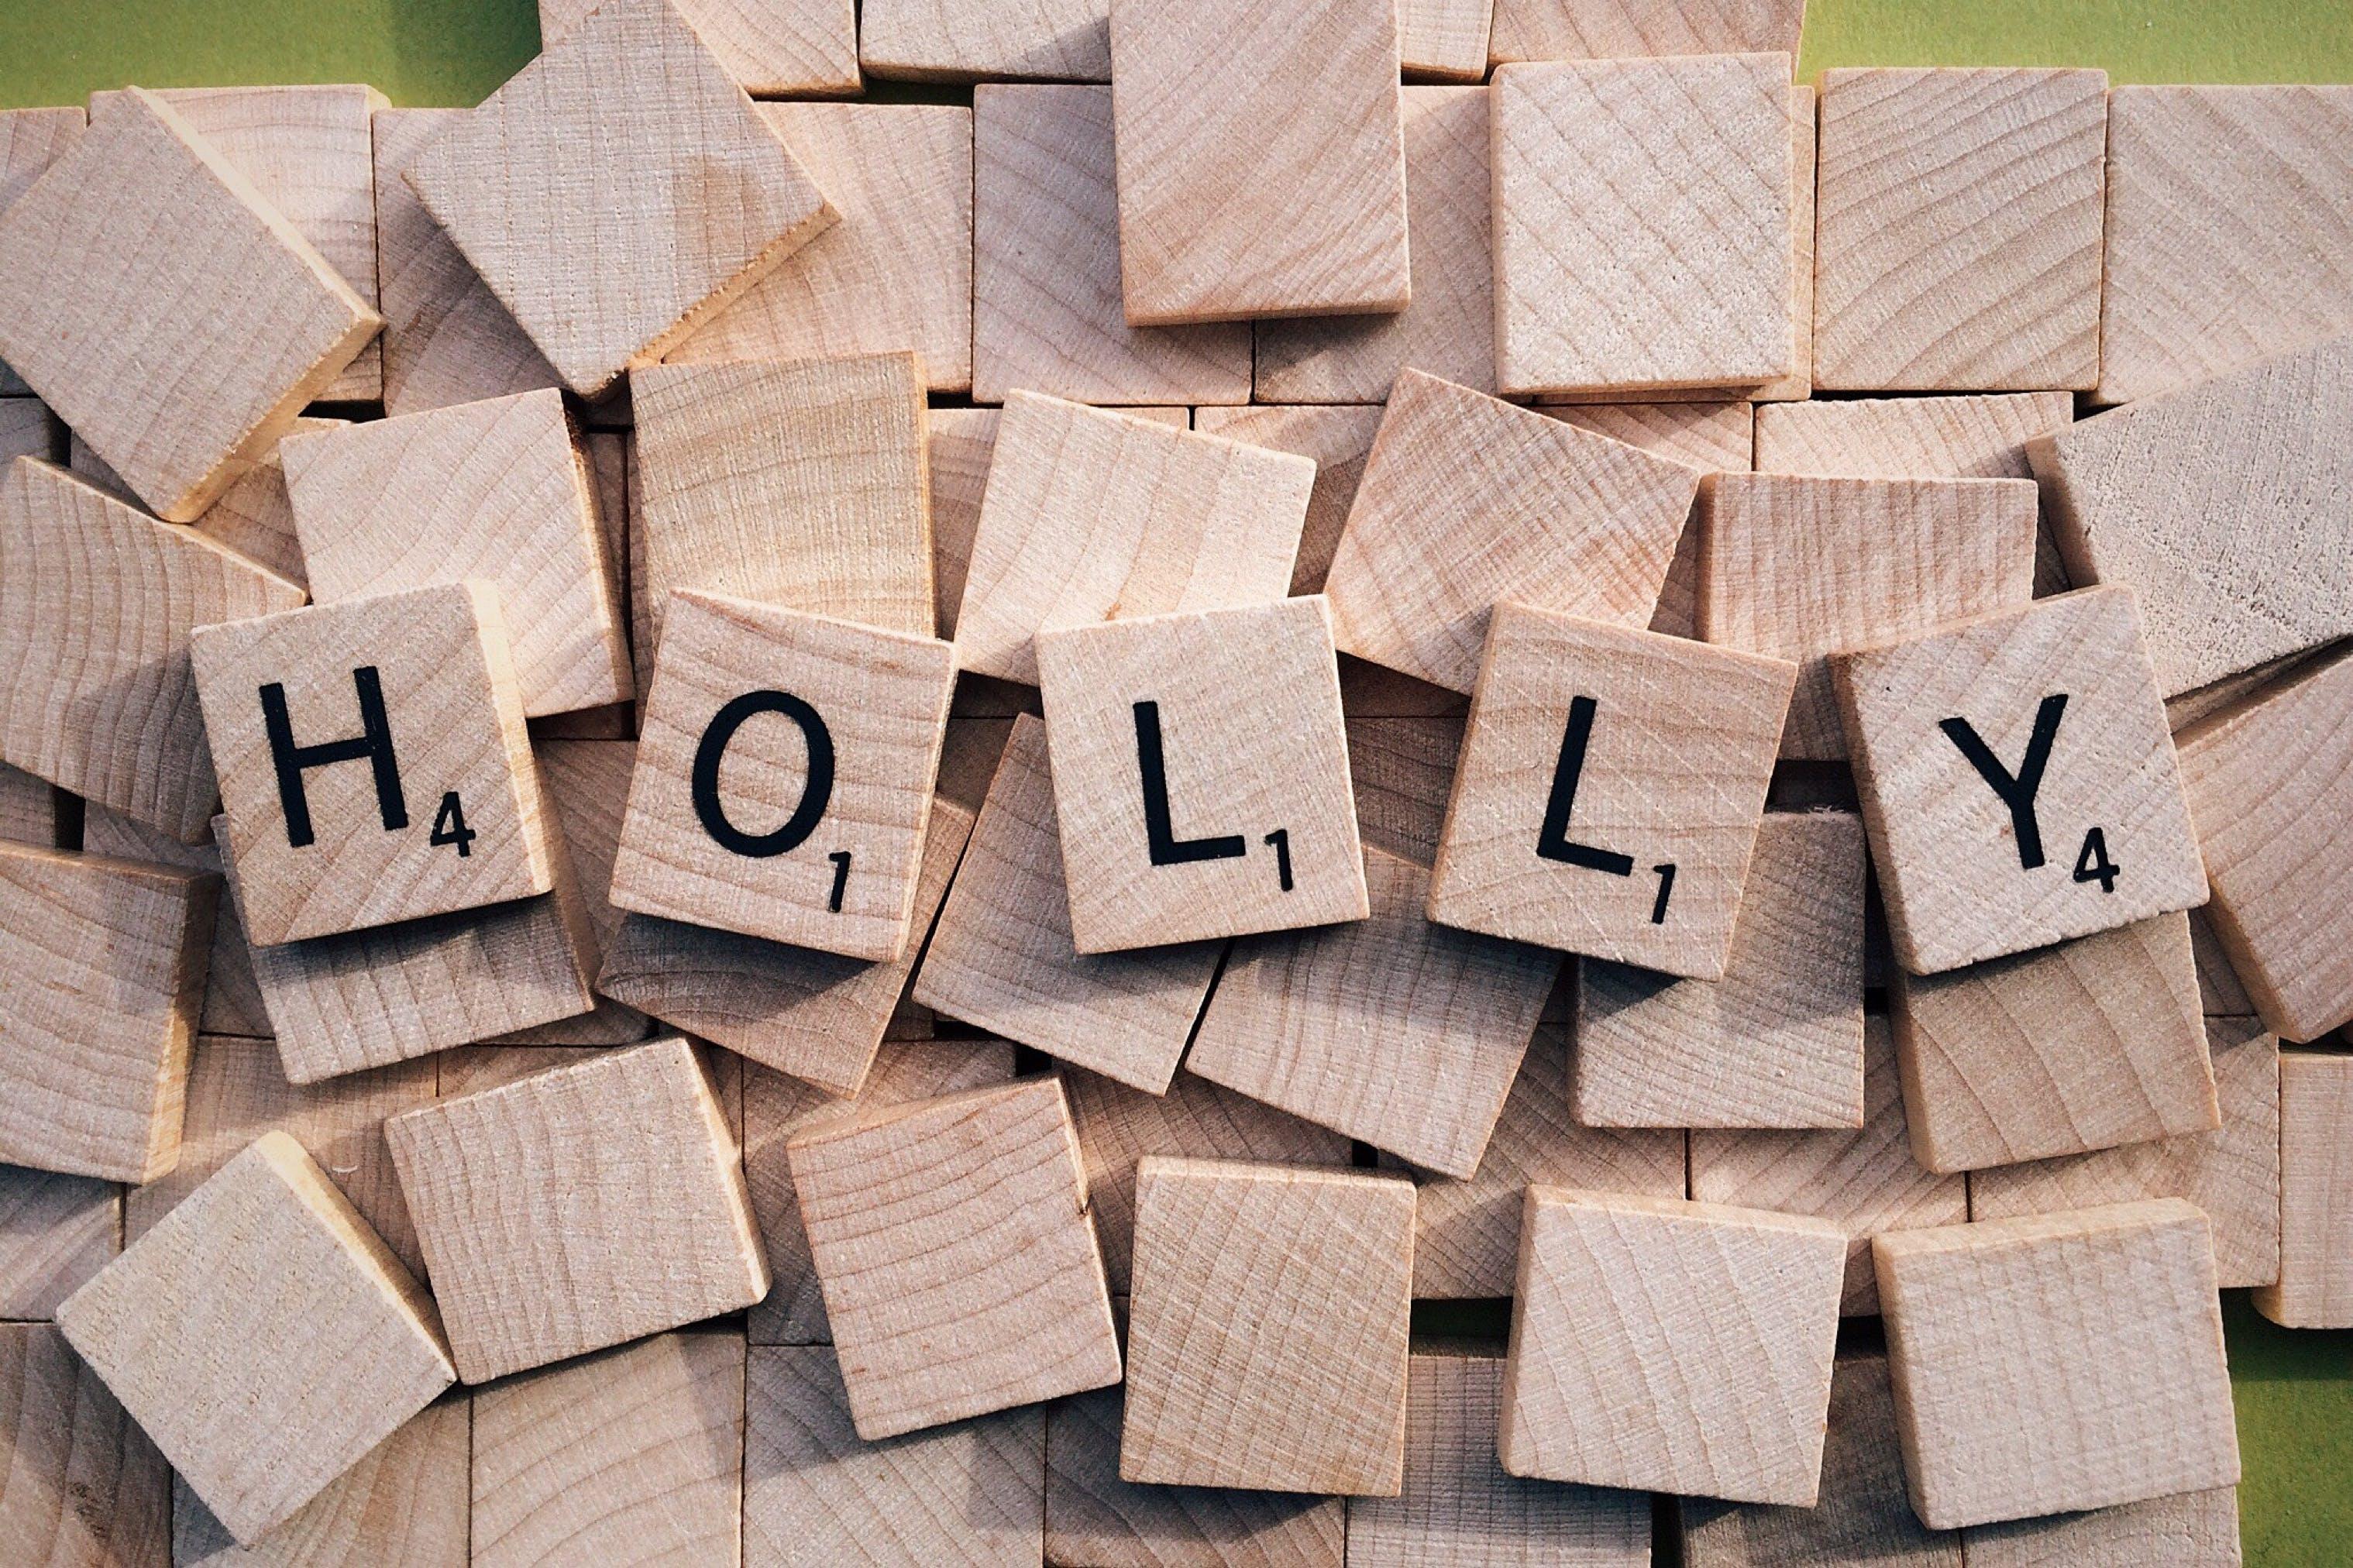 Holly Scrabble